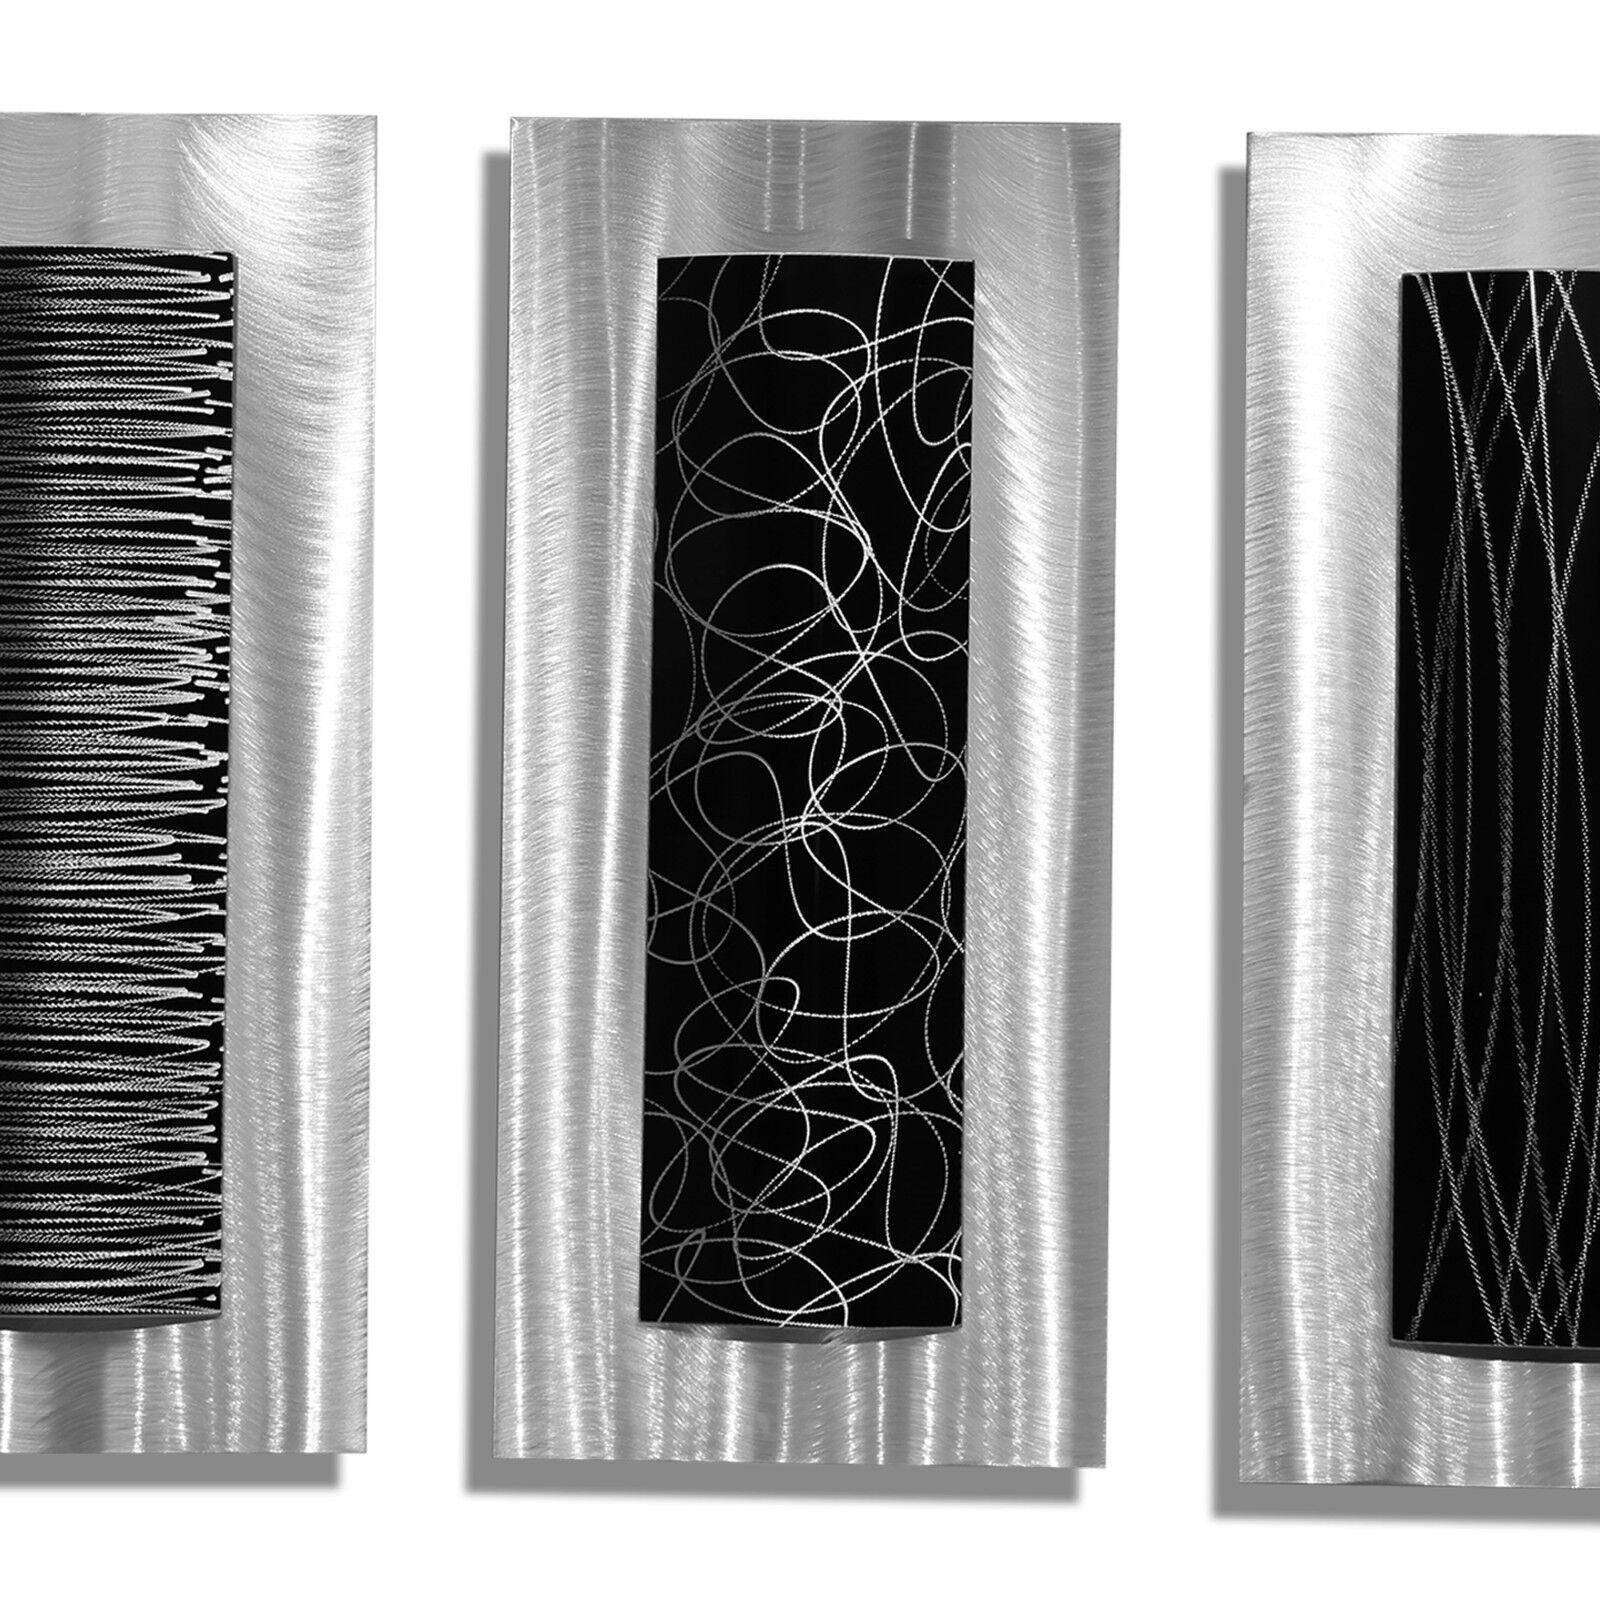 Abstract Metal Wall Art - Silver Black Decor - 3 Unique ...